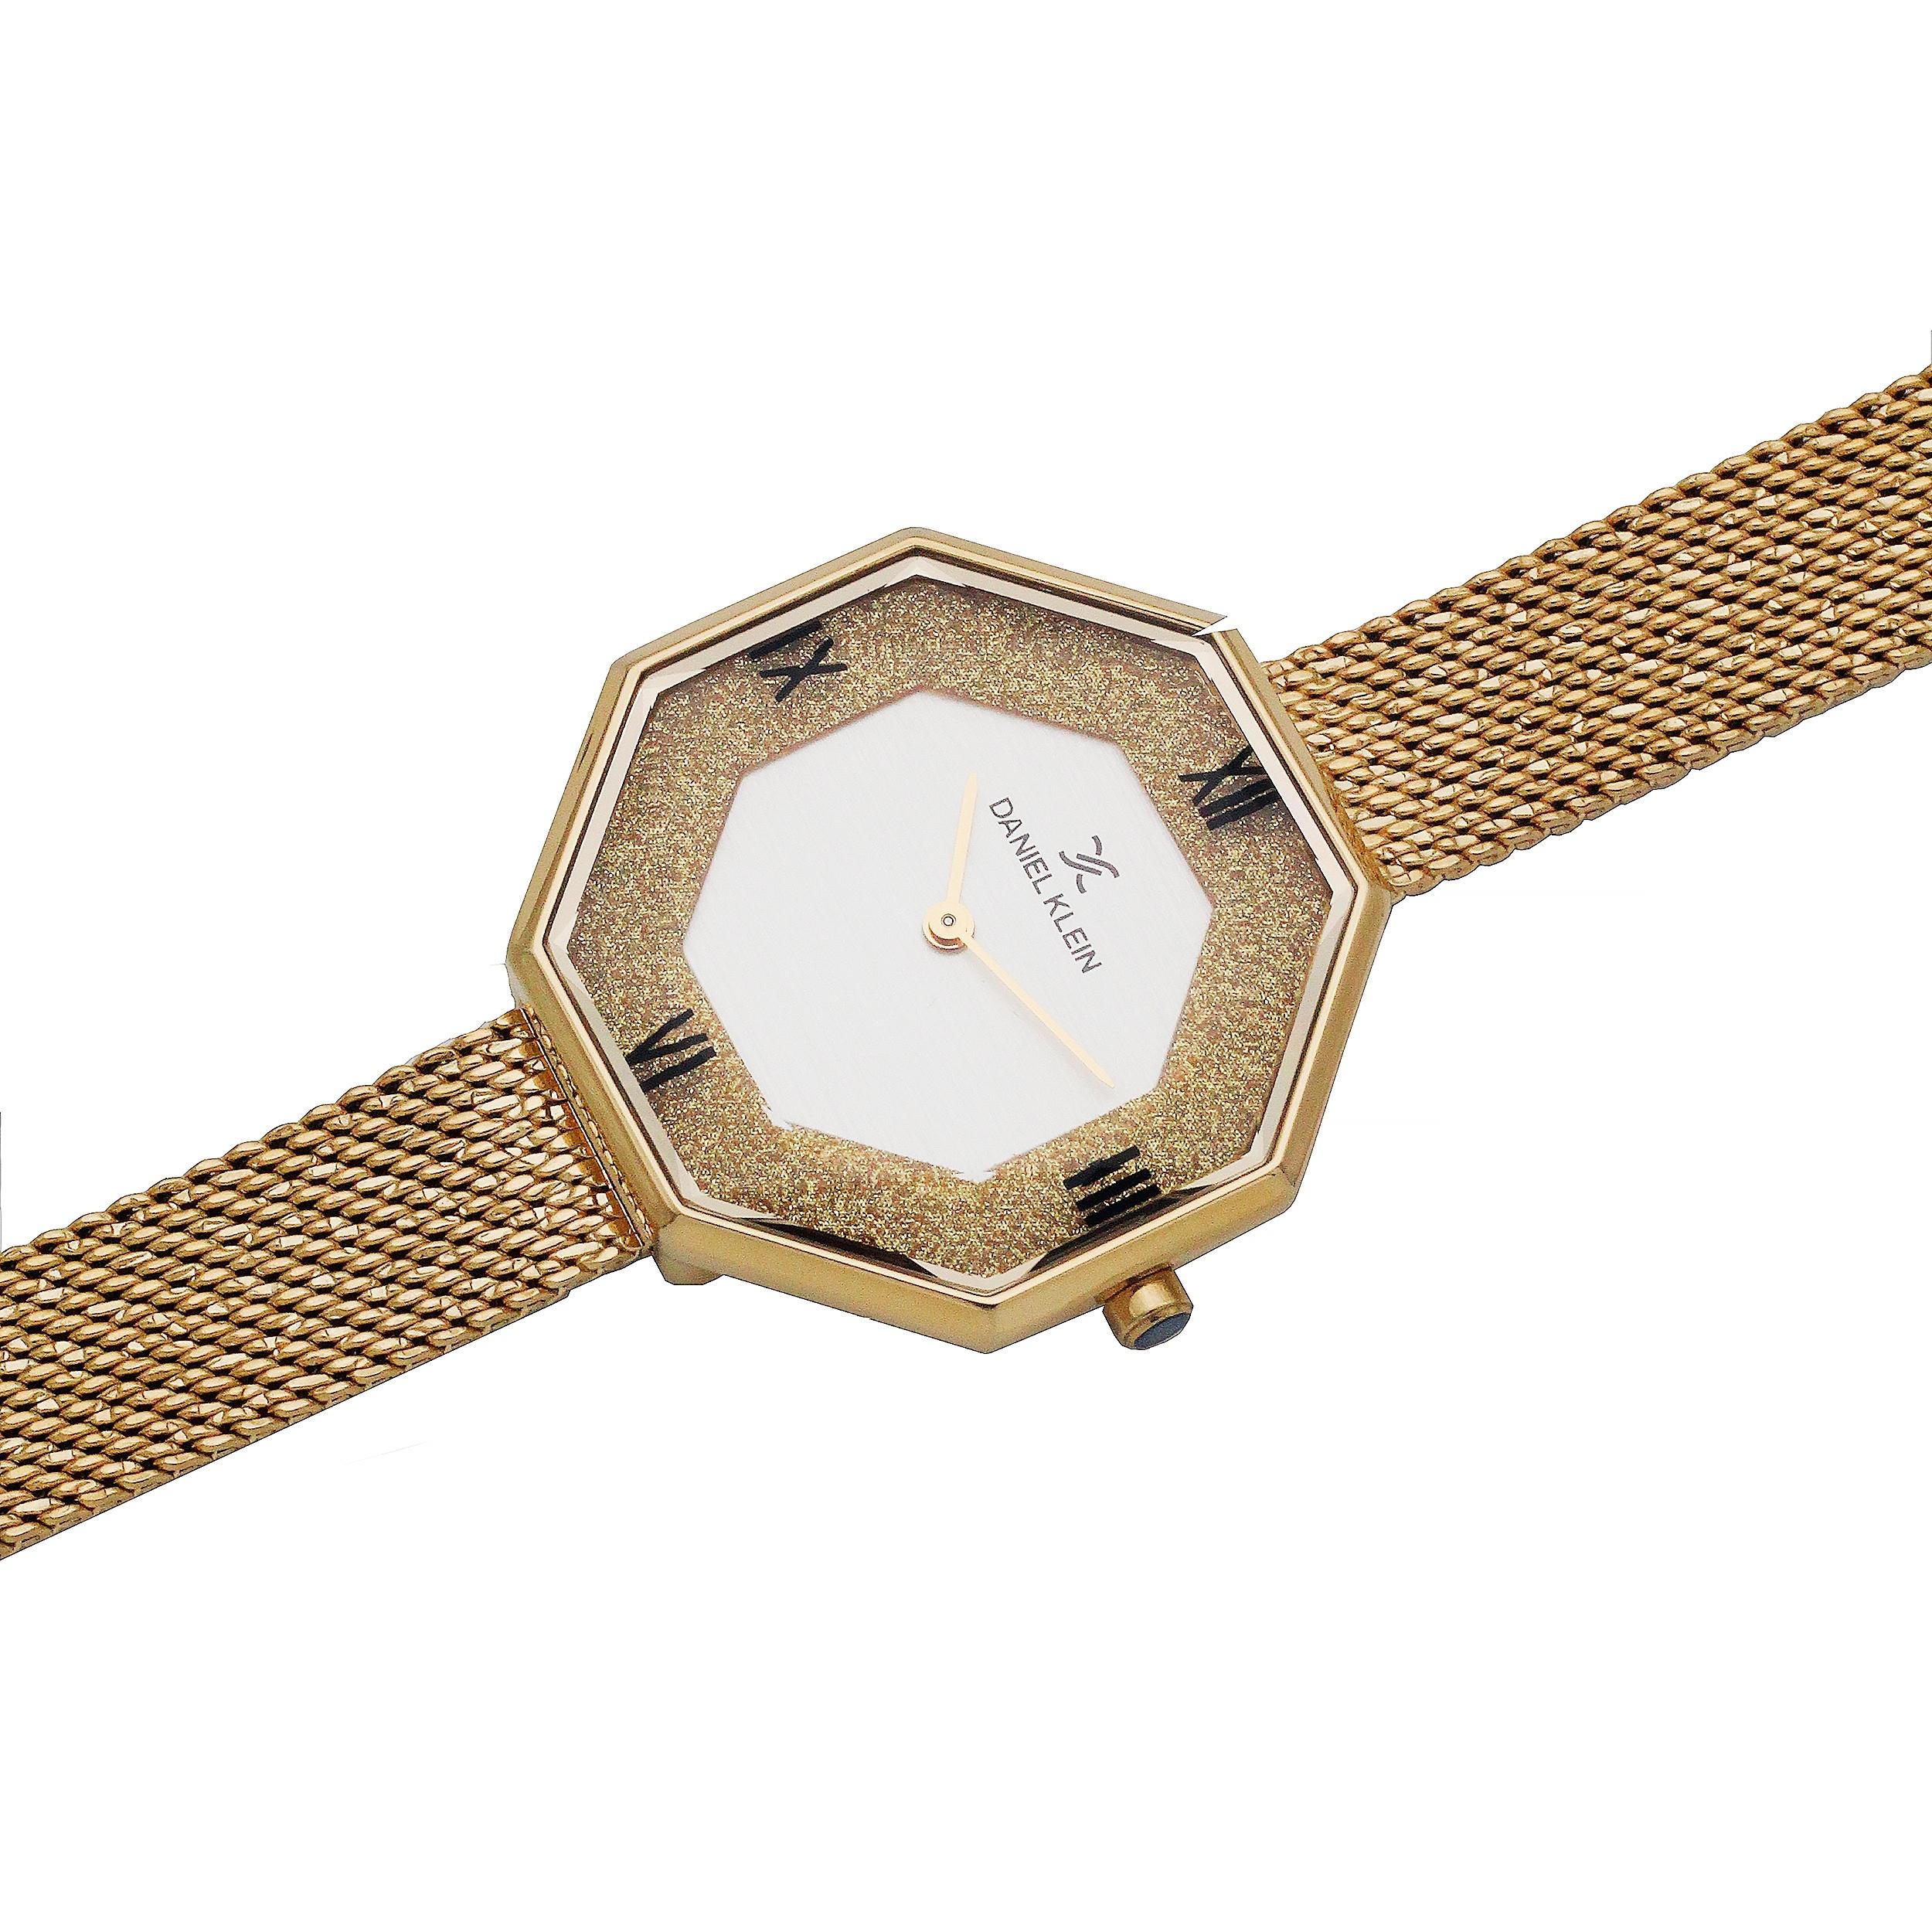 خرید و قیمت                      ساعت مچی  زنانه دنیل کلین مدل DK12200-2